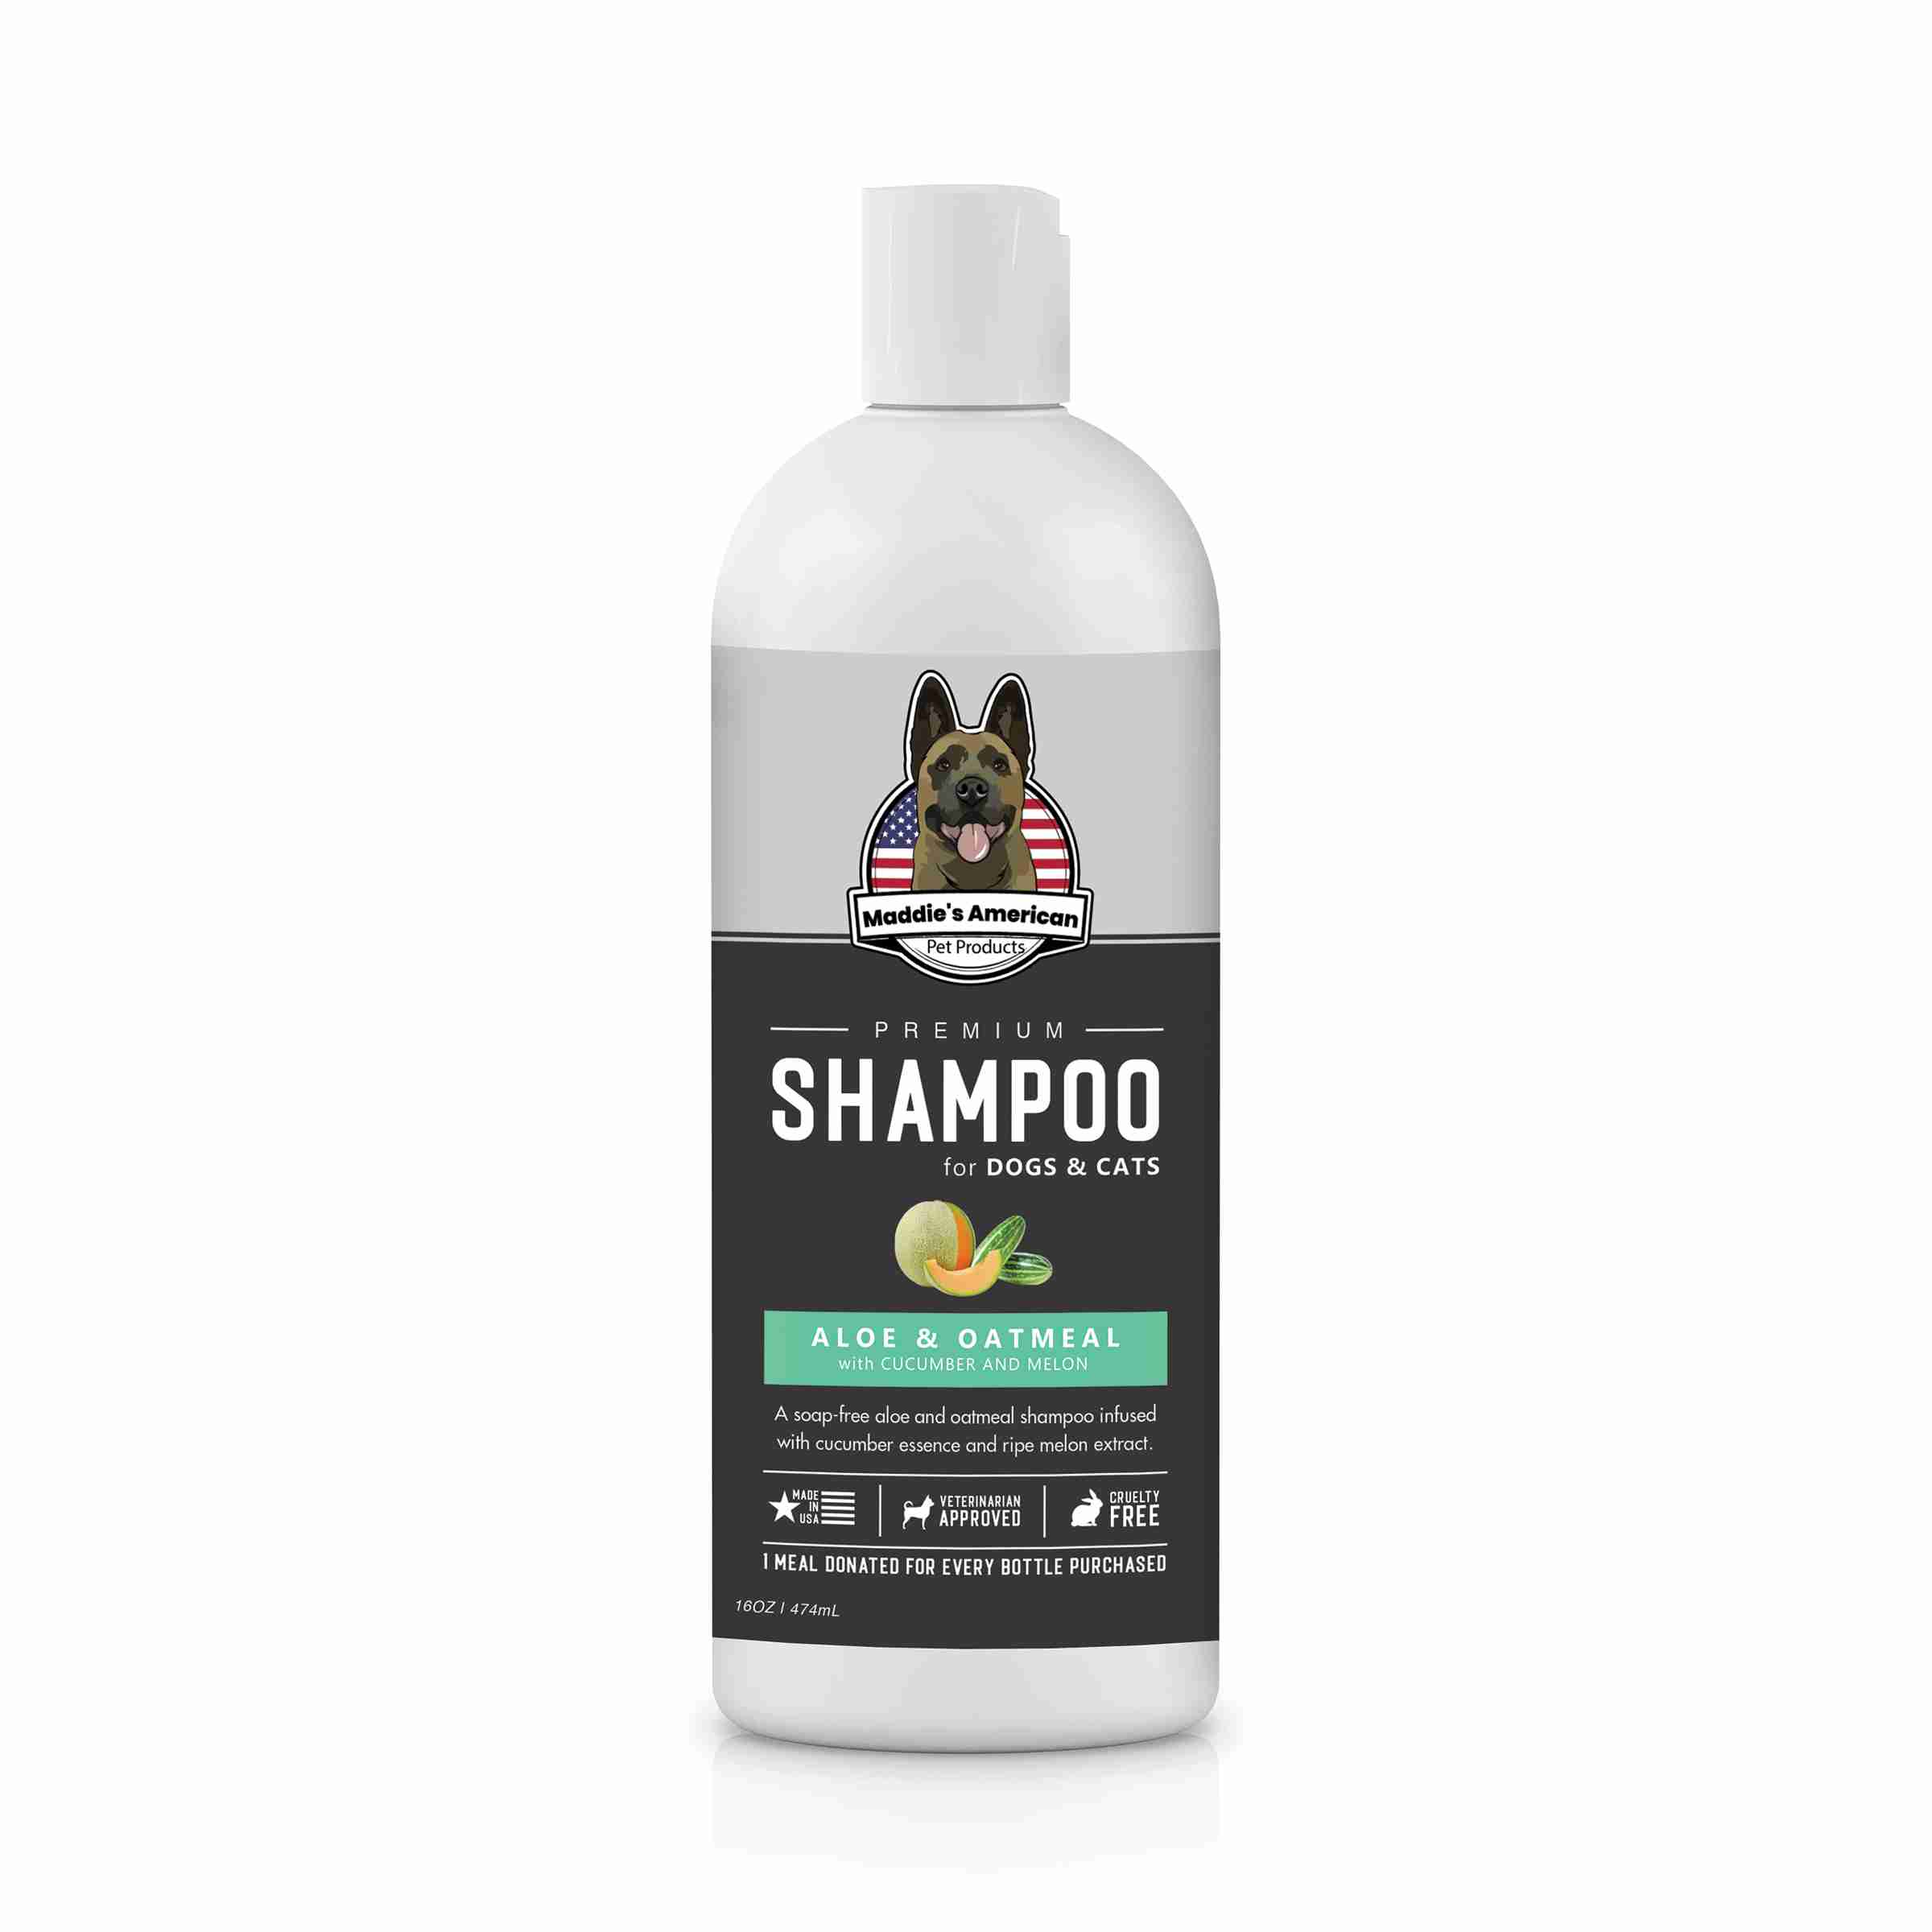 dog-shampoo with cash back rebate